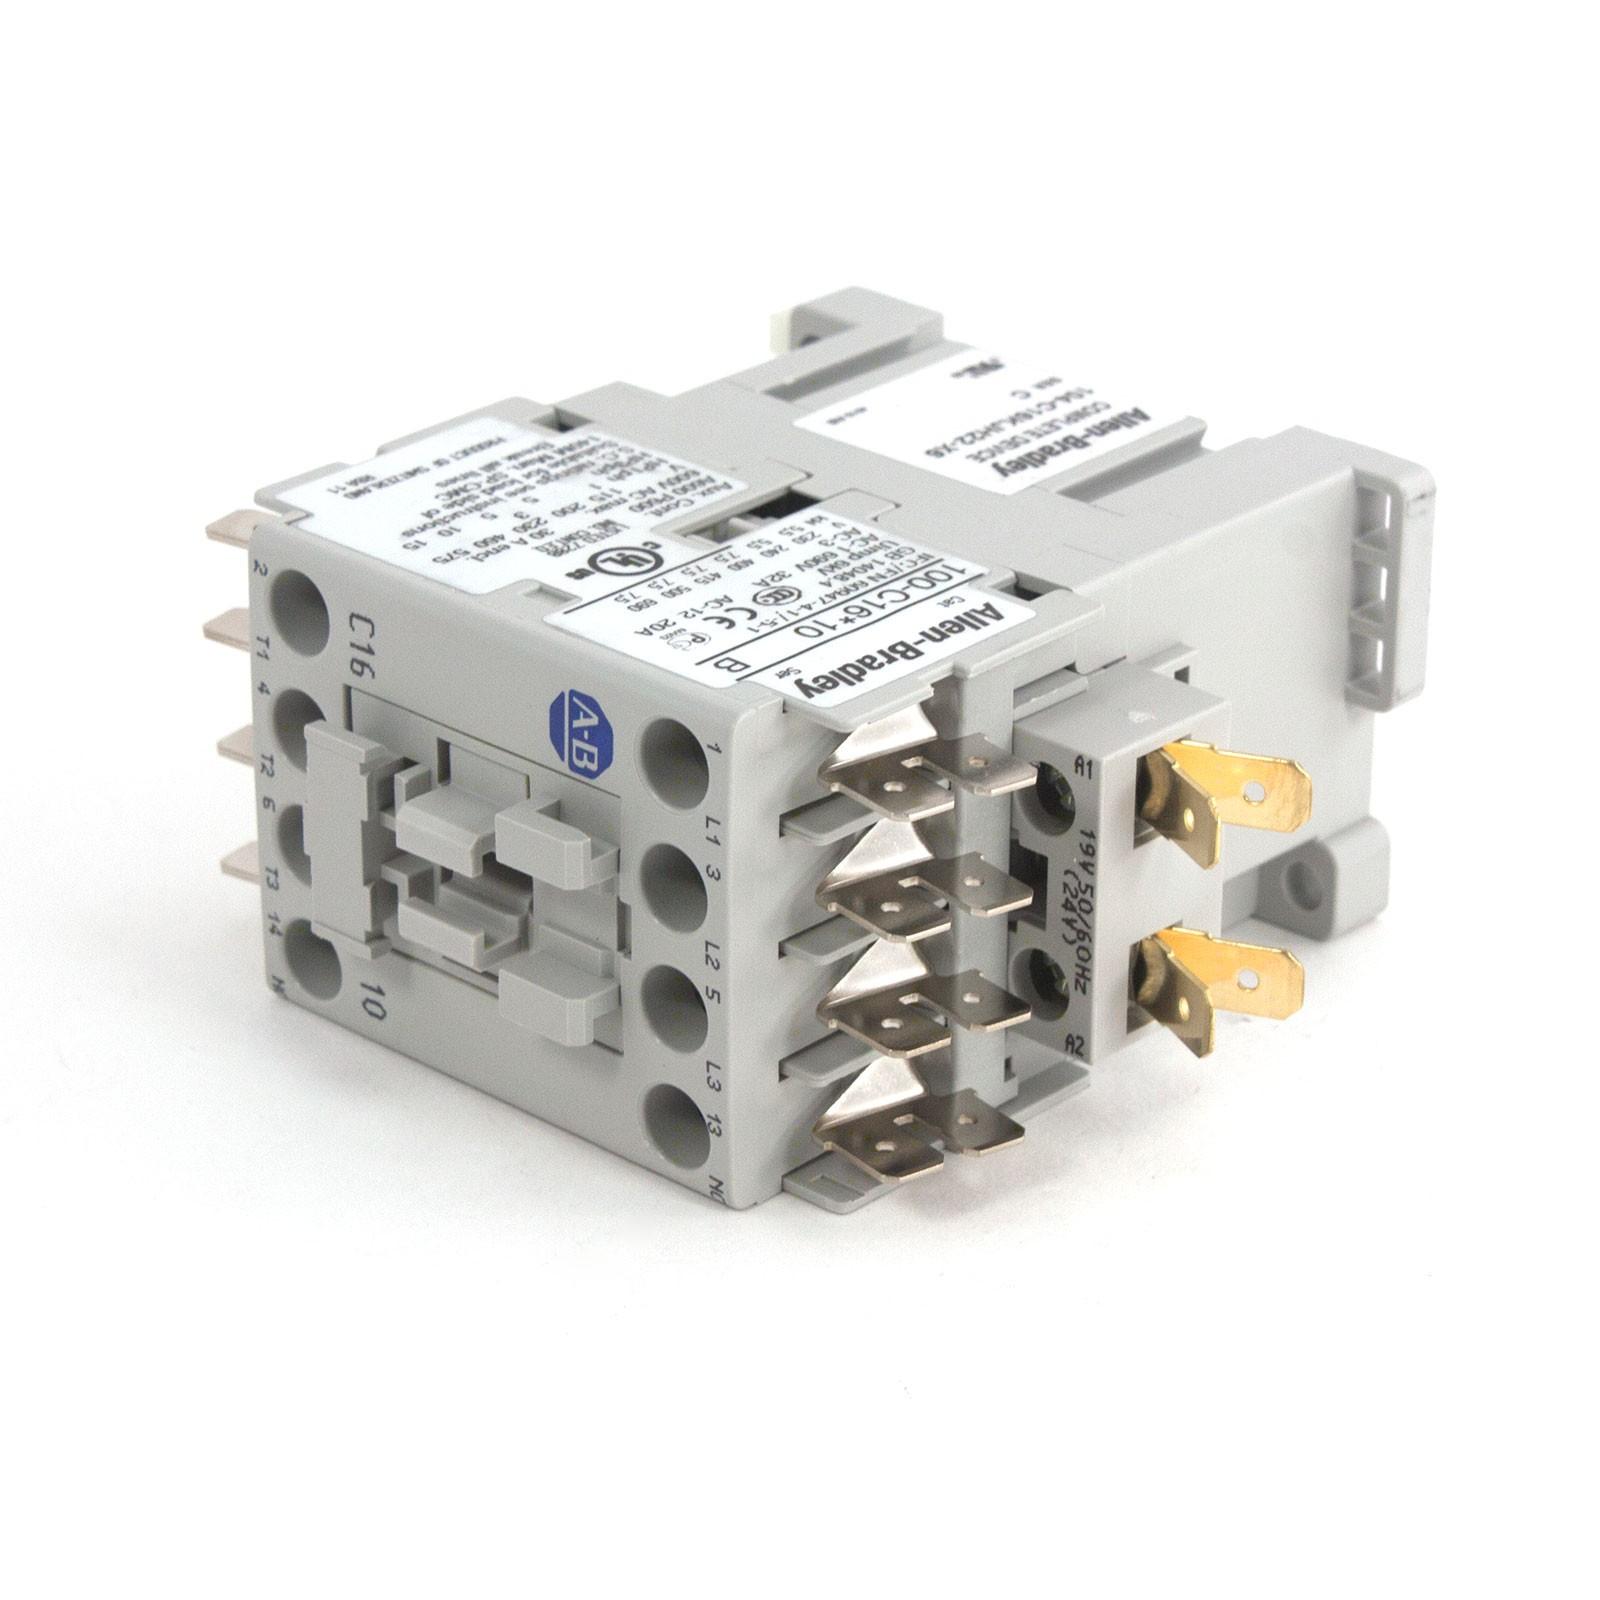 Linear Osco 2500 2084 Half Brake Contactor Half Block